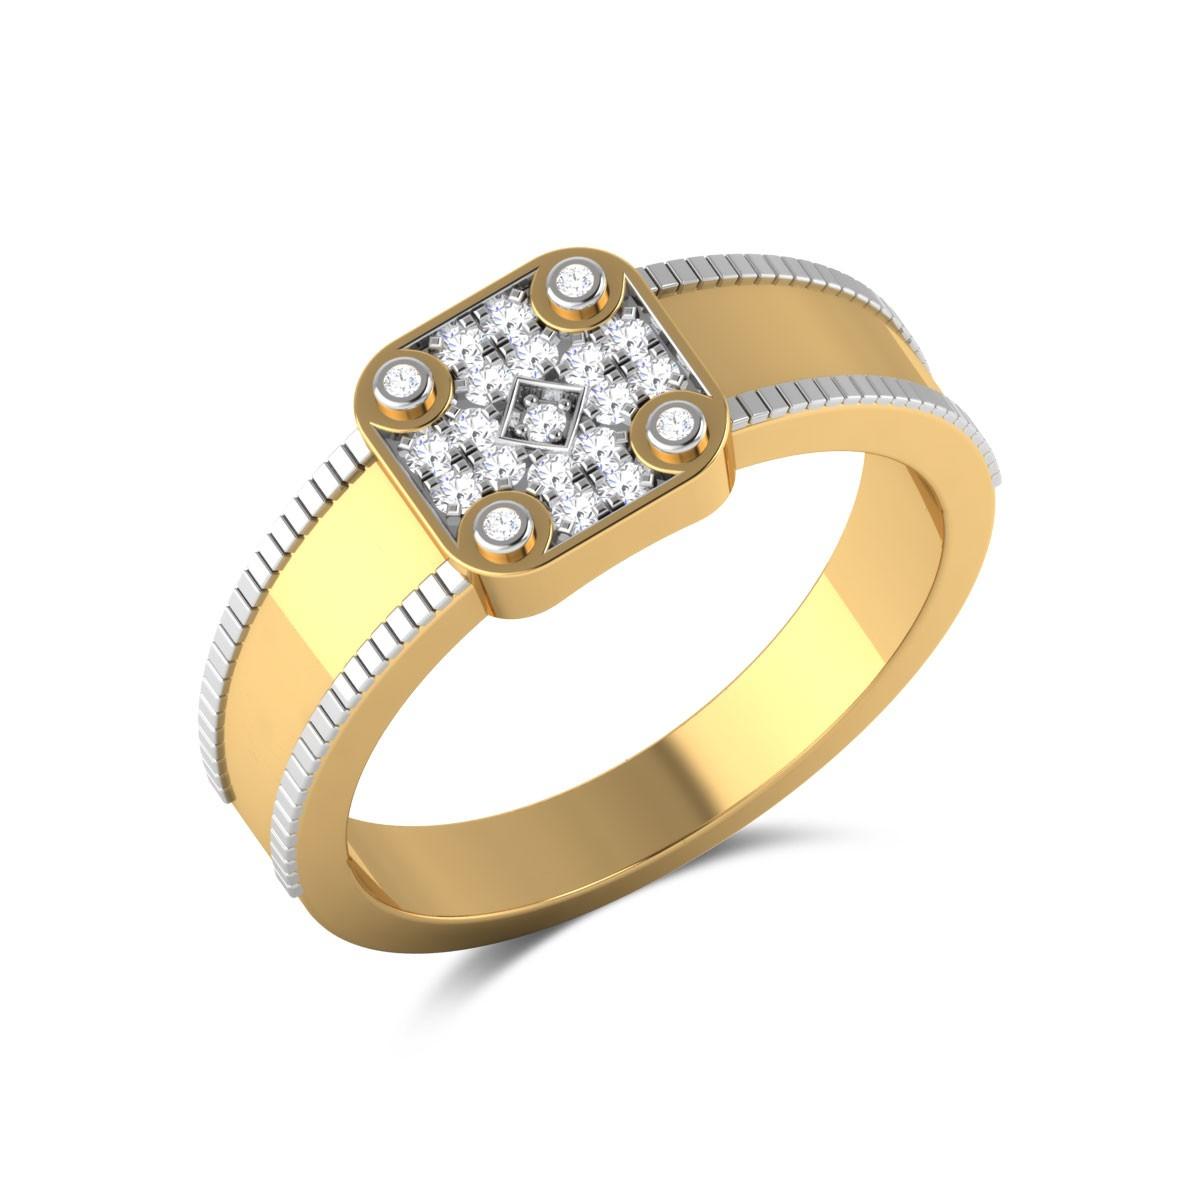 Amaan Diamond Ring